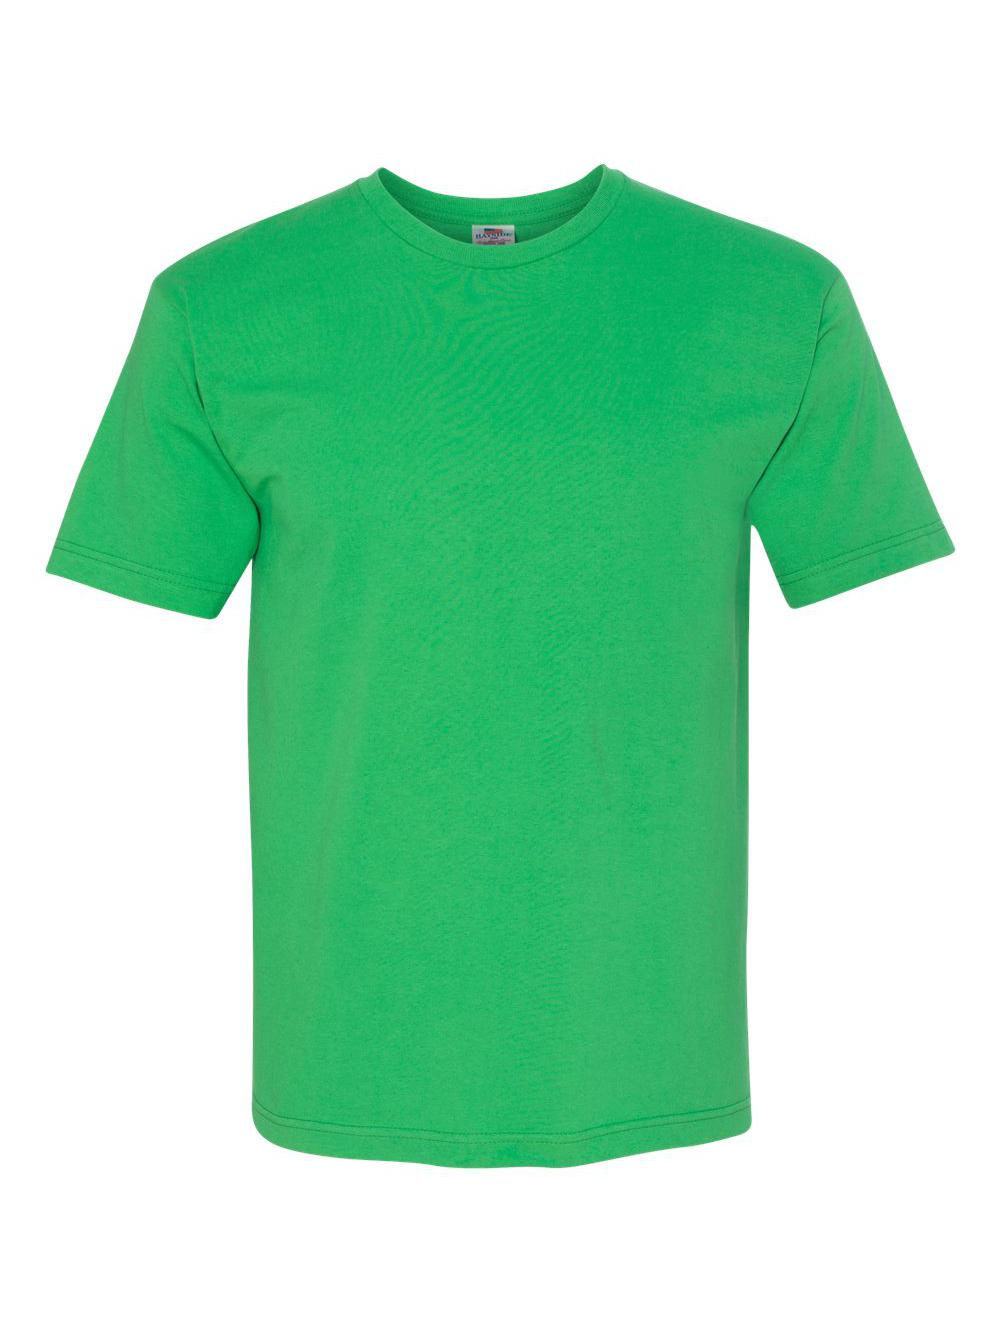 Bayside-USA-Made-100-Cotton-Short-Sleeve-T-Shirt-5040 thumbnail 18